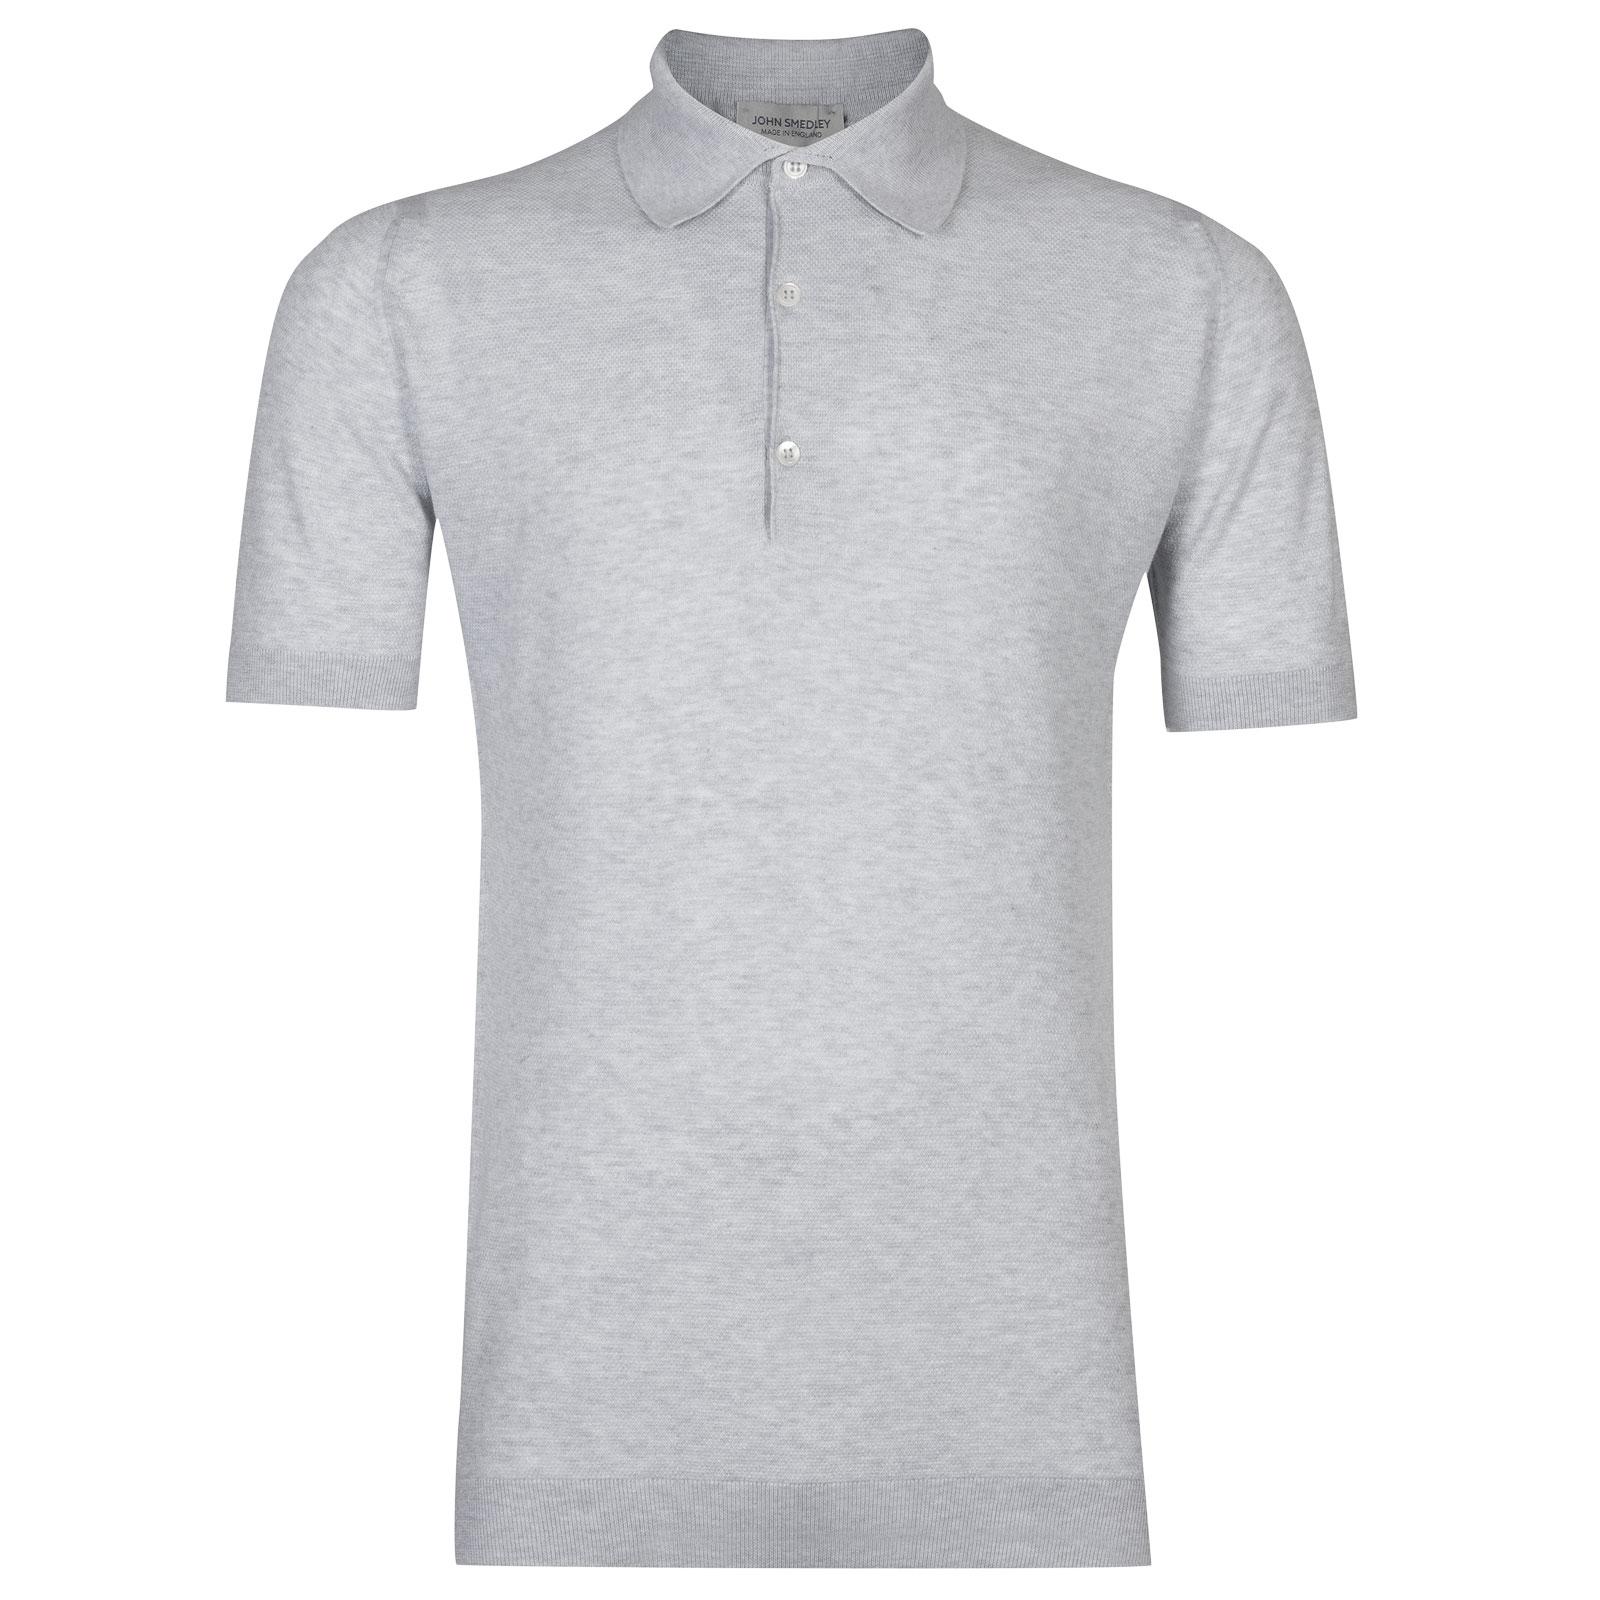 John Smedley roth Sea Island Cotton Shirt in Feather Grey-XXL